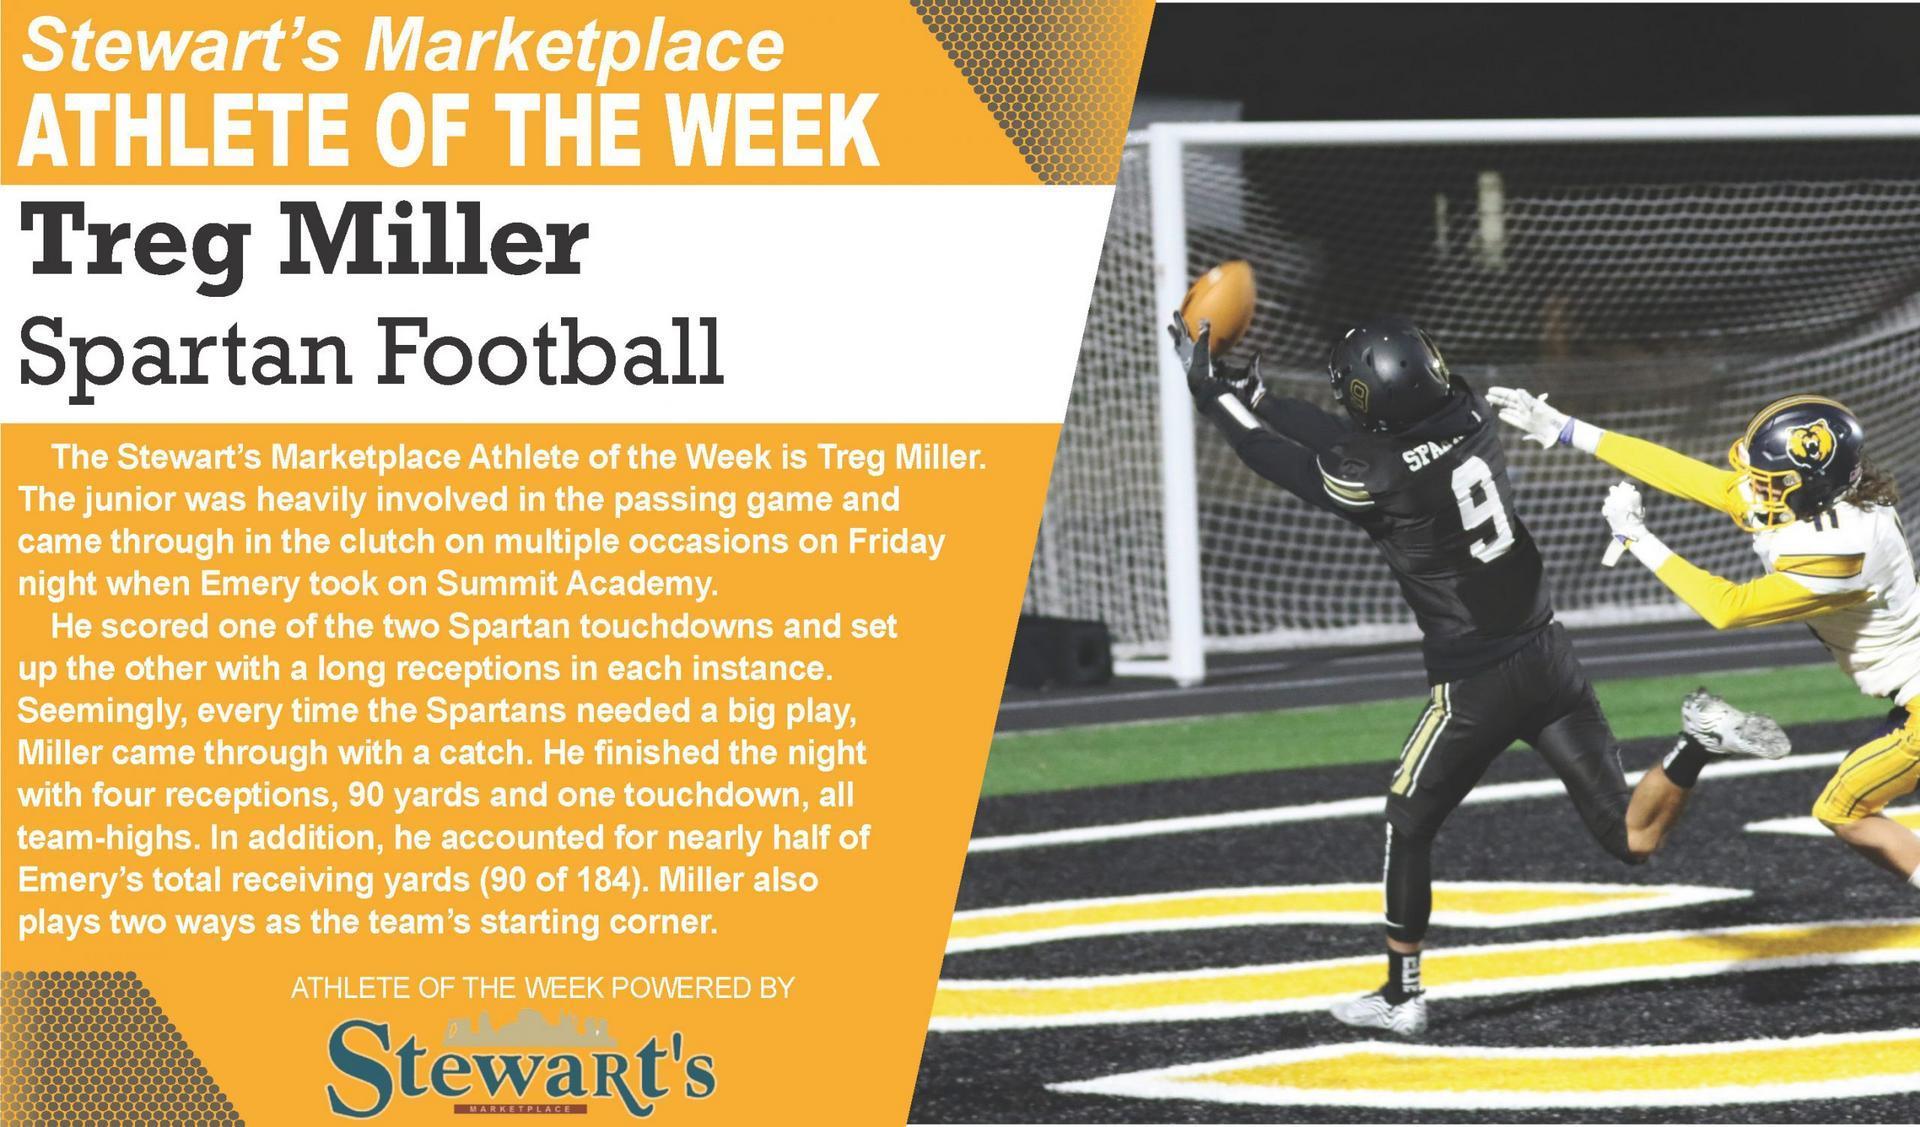 Emery-Athlete-of-the-Week-Treg-Miller-10.20.21-scaled.jpg